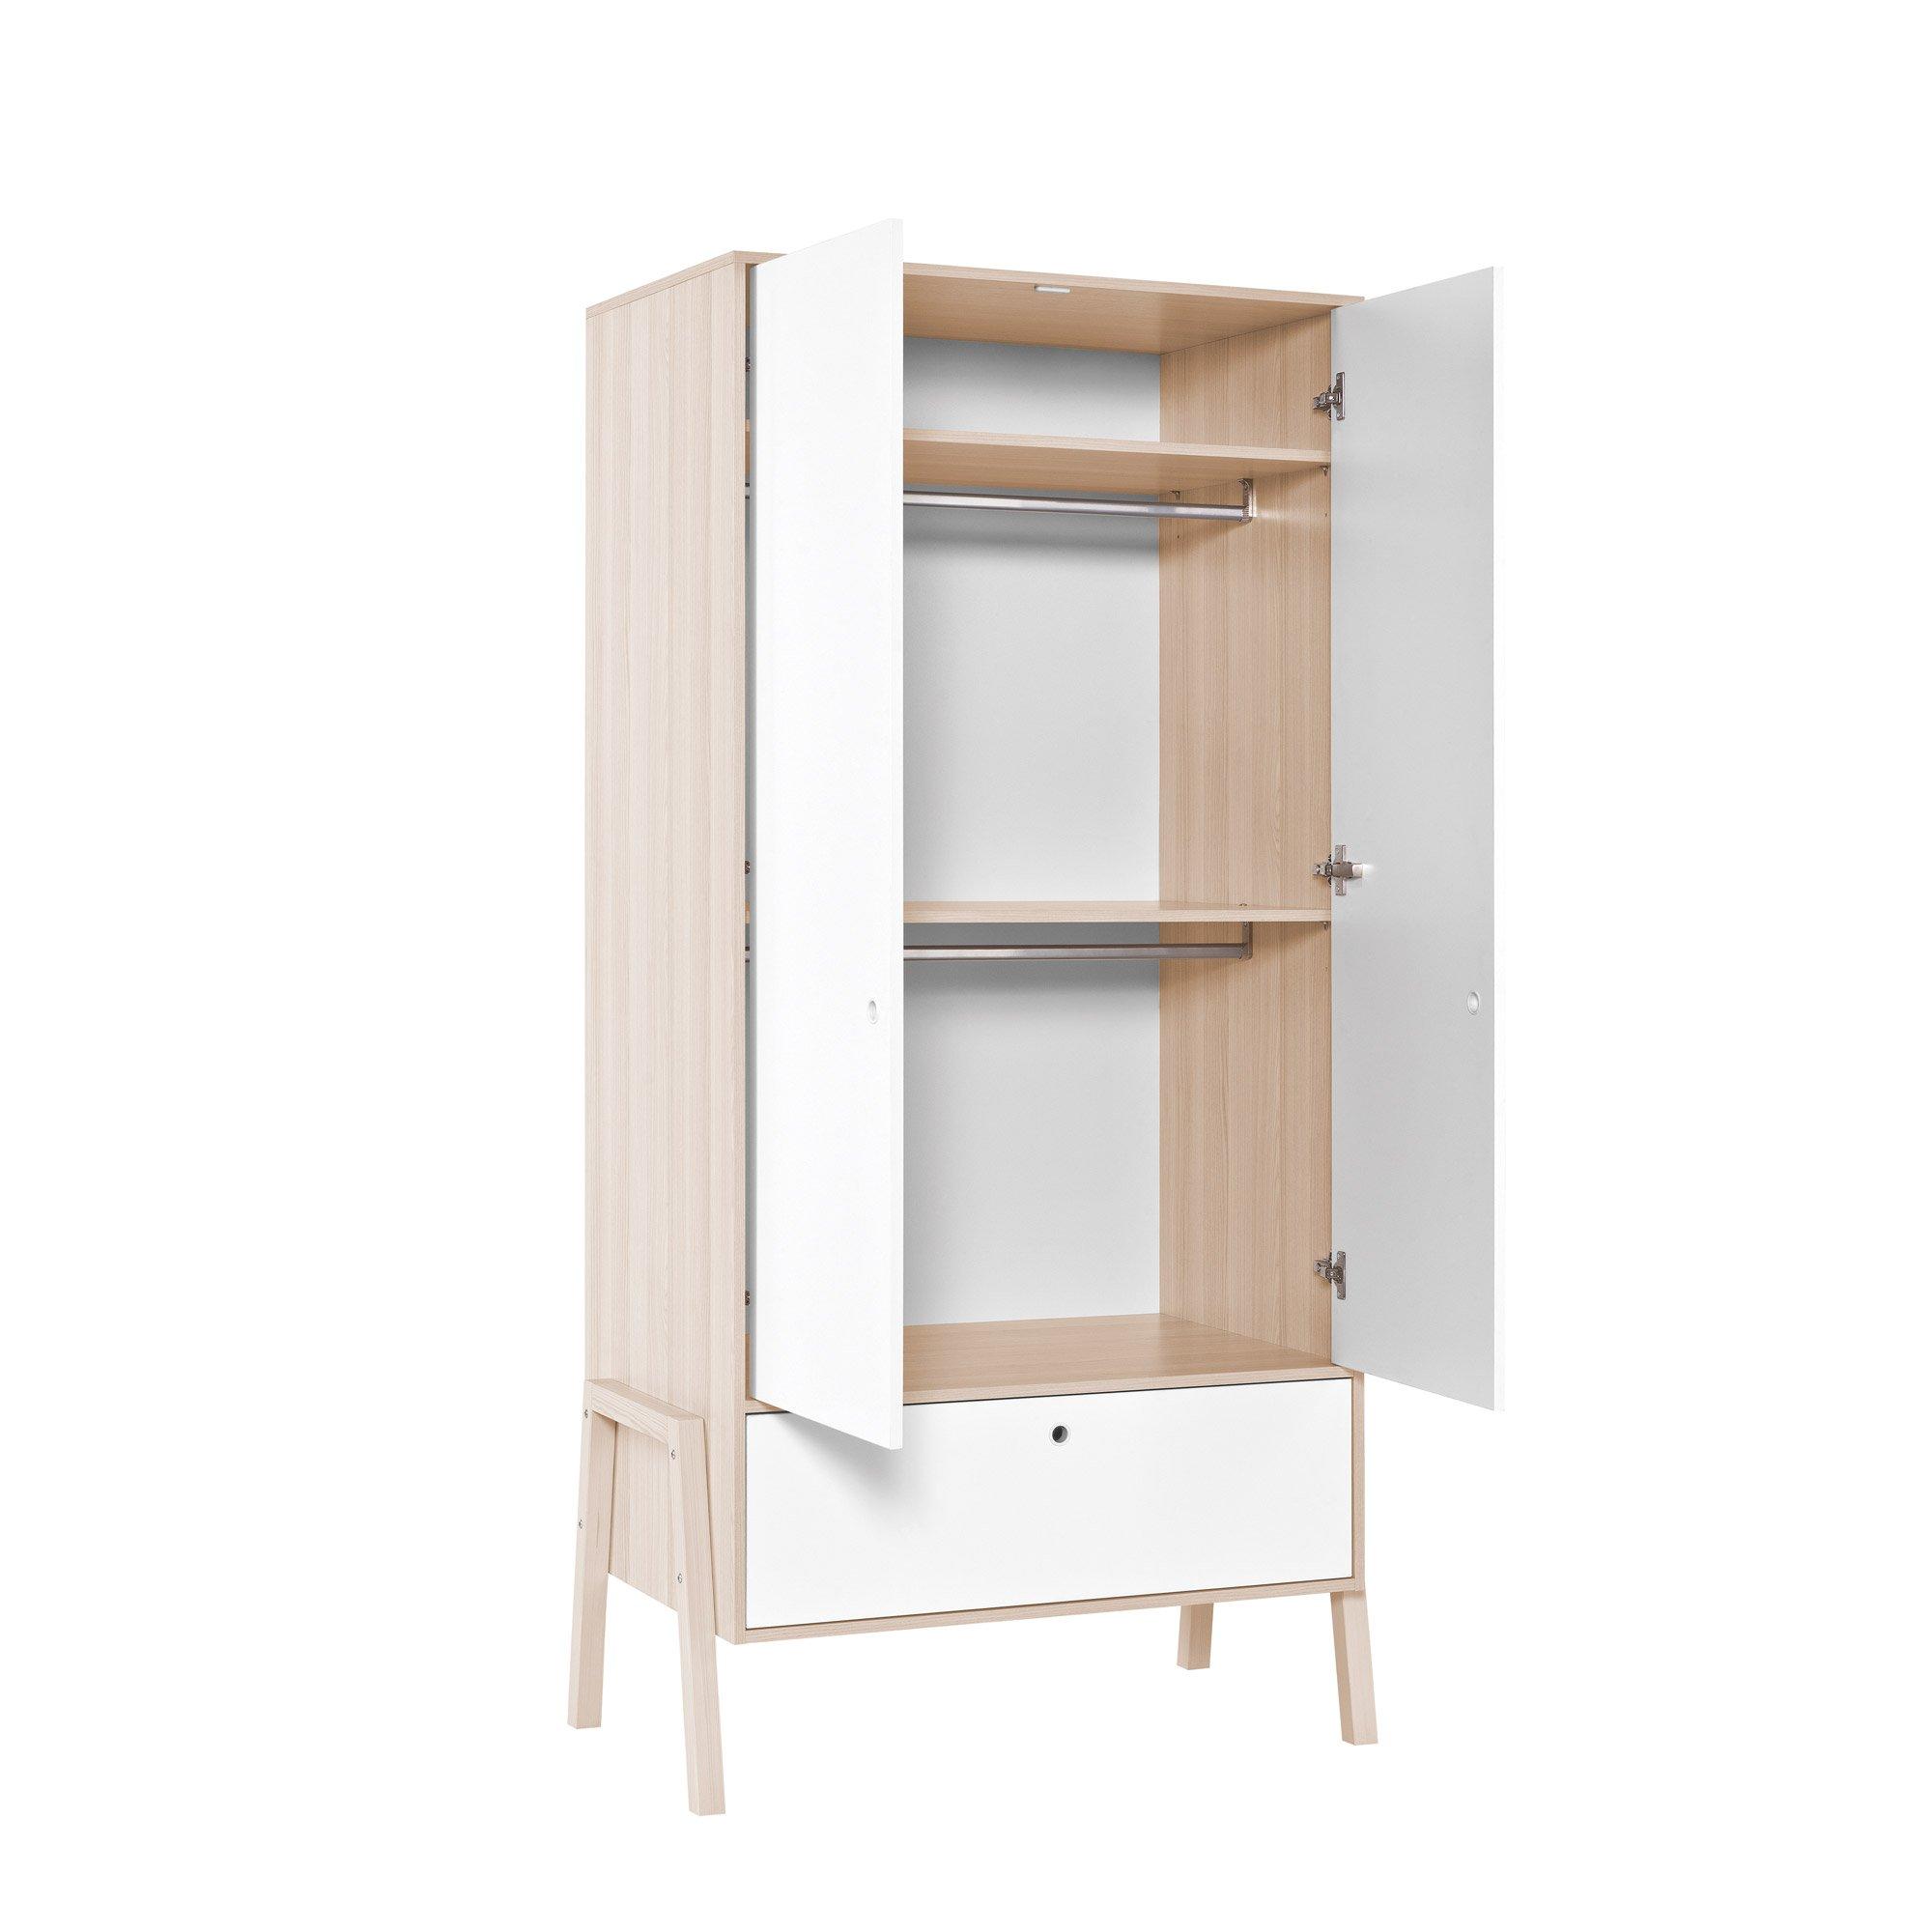 Spot armoire 2 portes Blanc / Acacia  de Vox